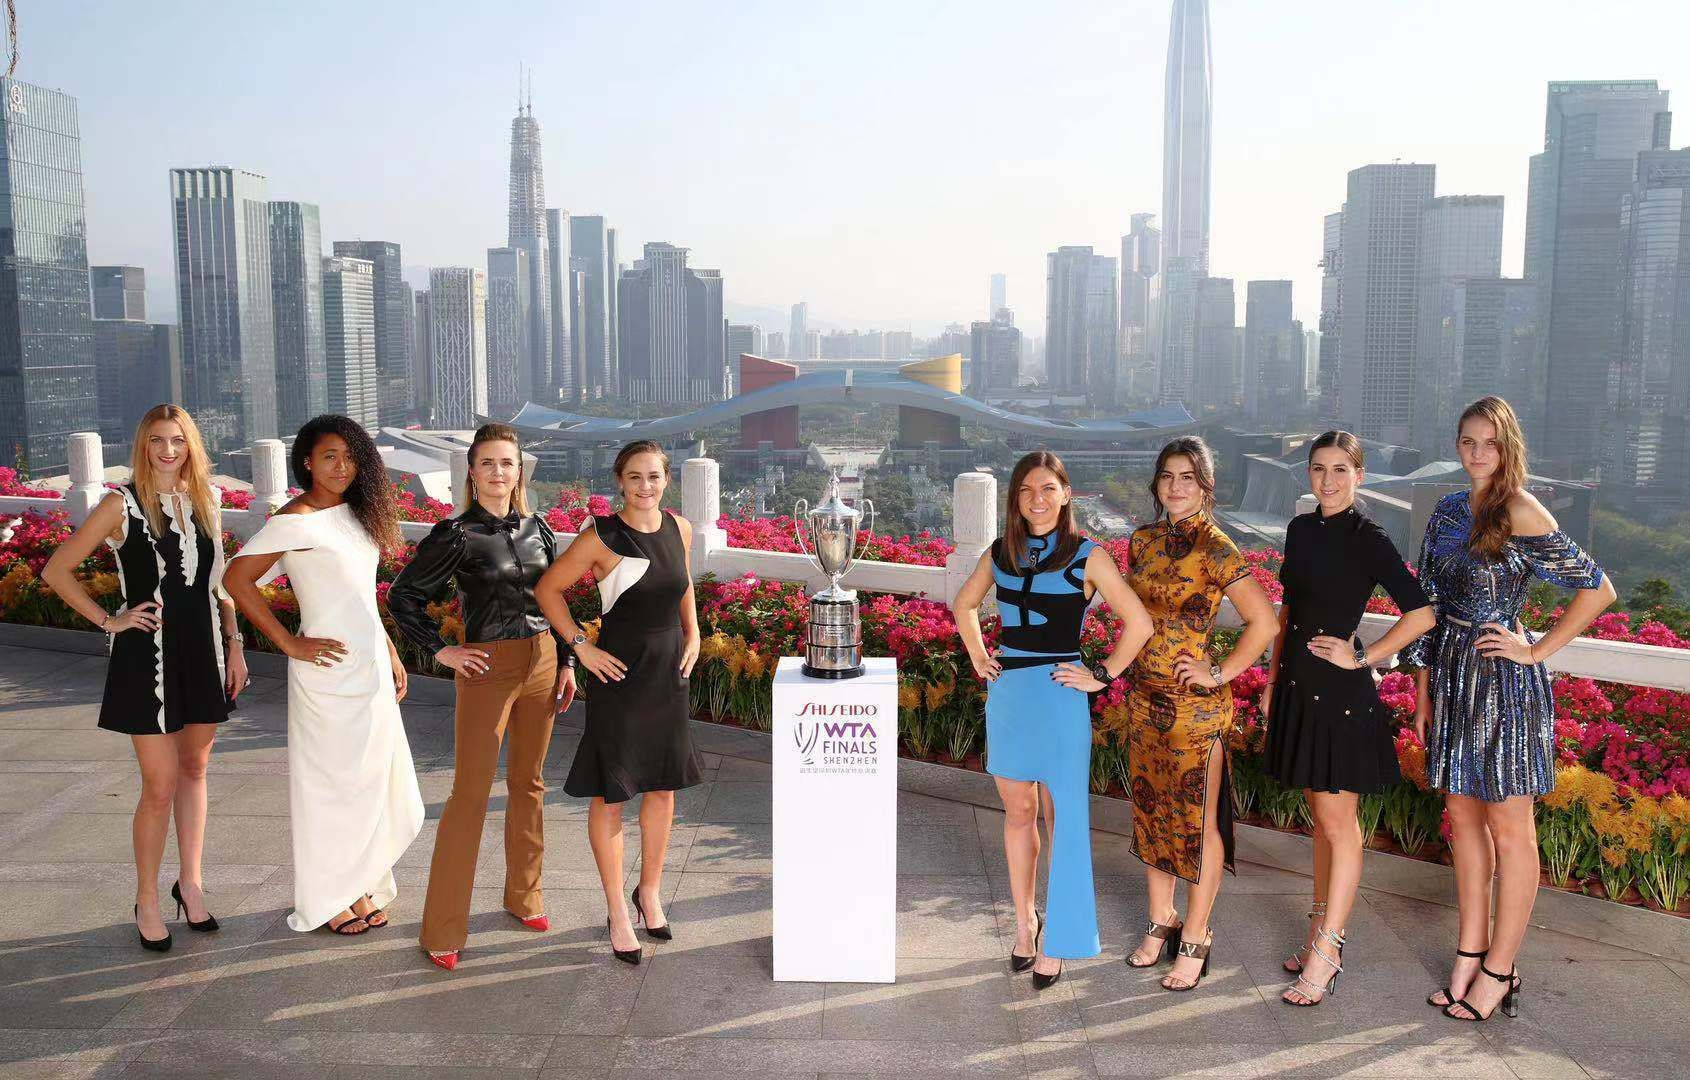 WTA Finals - Shenzhen: Ecco i gruppi di singolare e doppio